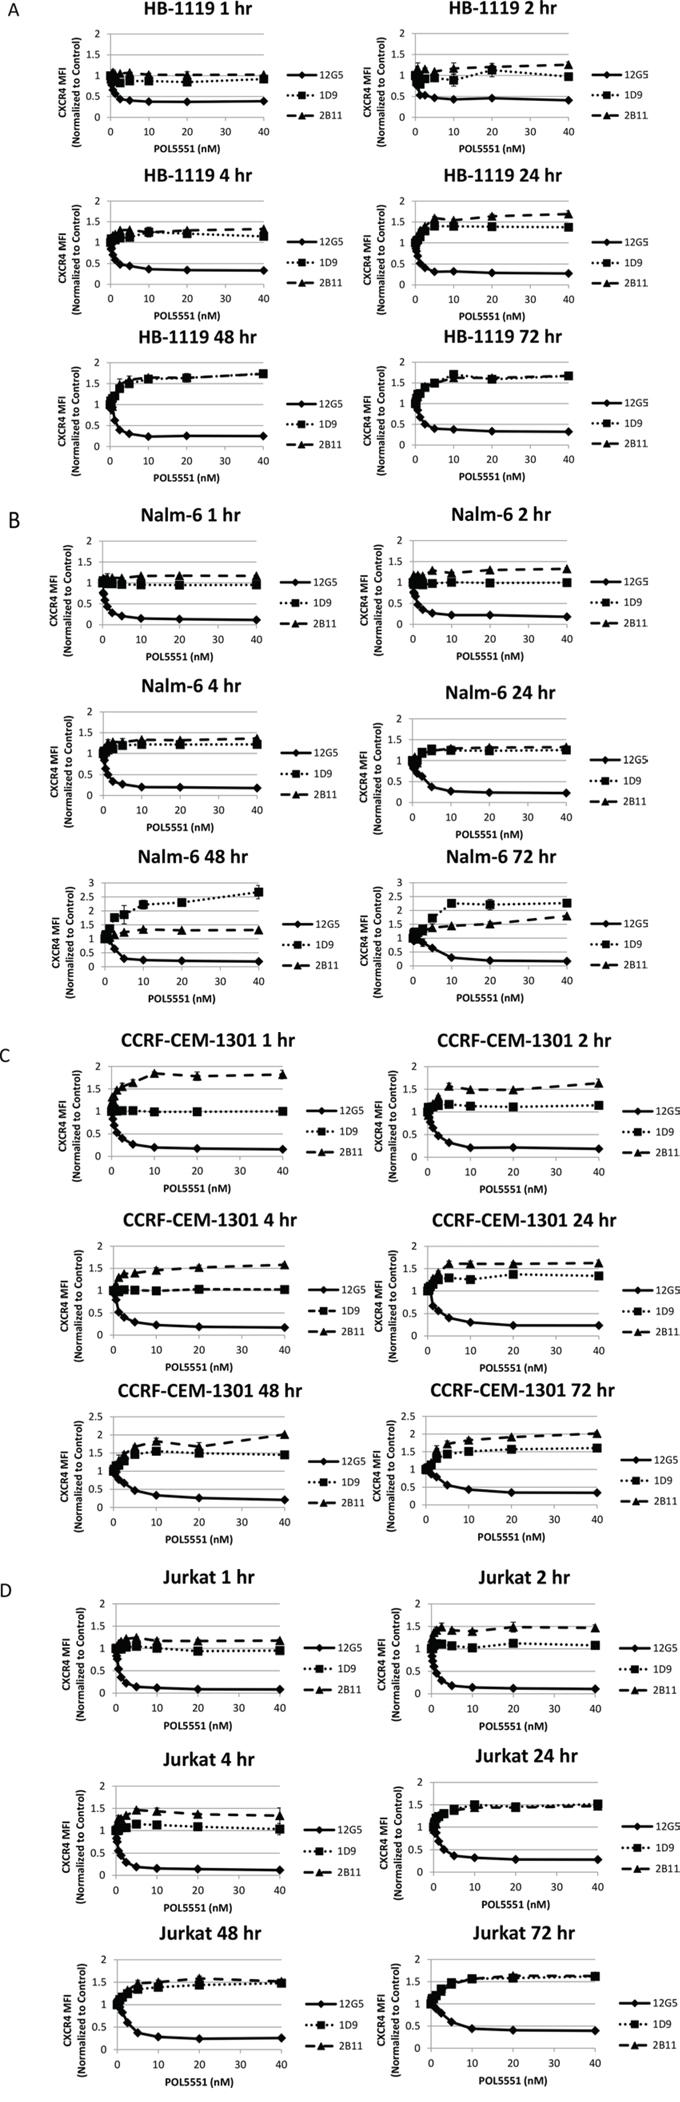 POL5551 simultaneously blocks 12G5 anti-CXCR4 antibody binding while increasing 1D9 and 2B11 anti-CXCR4 antibody binding.